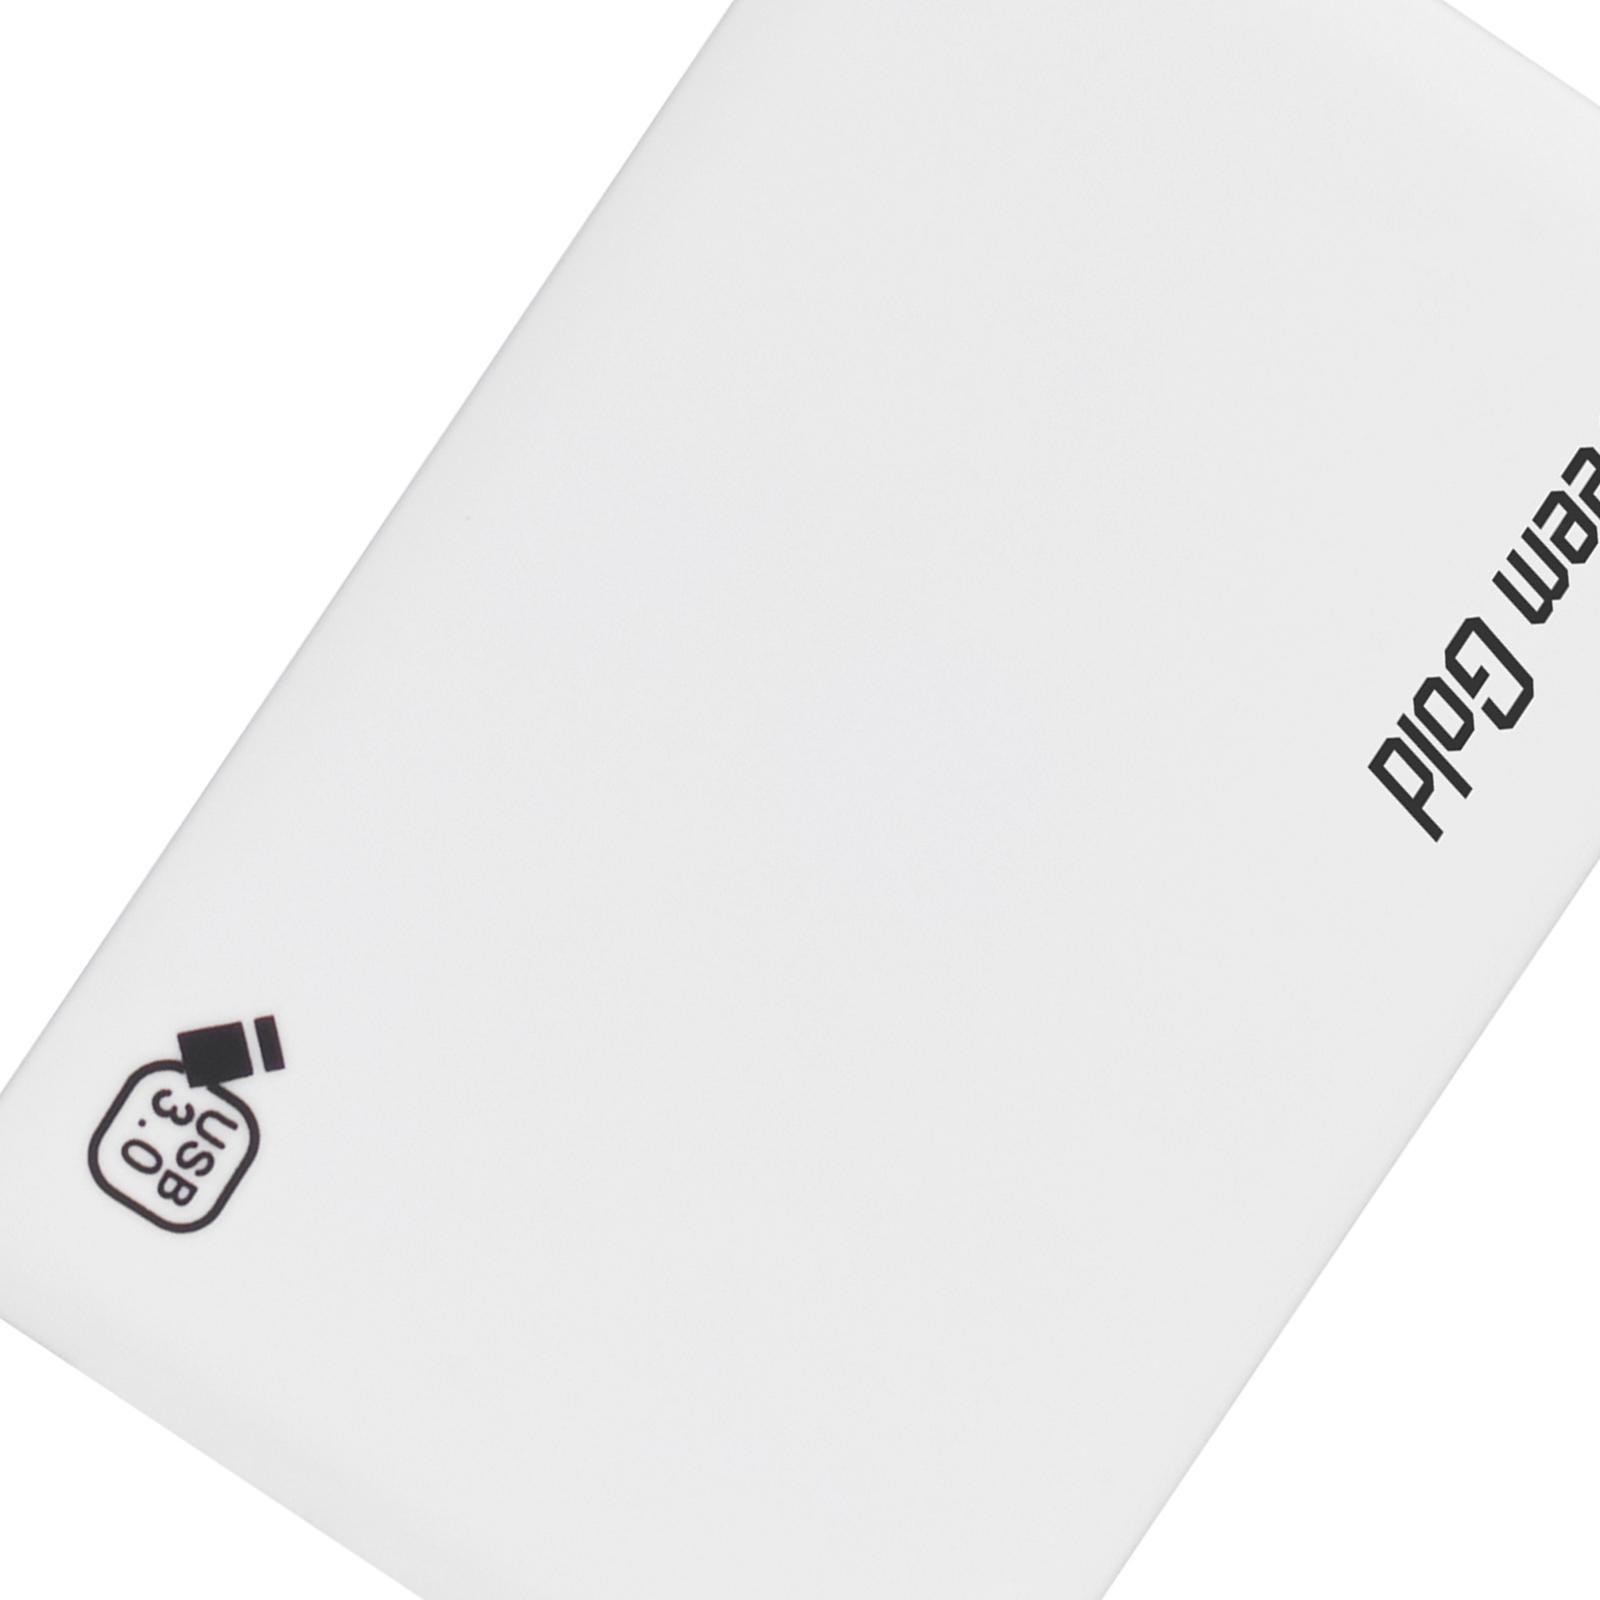 miniature 25 - ABS External Portable USB 3.0 Hard Drive Disk HDD for Desktop Laptop New